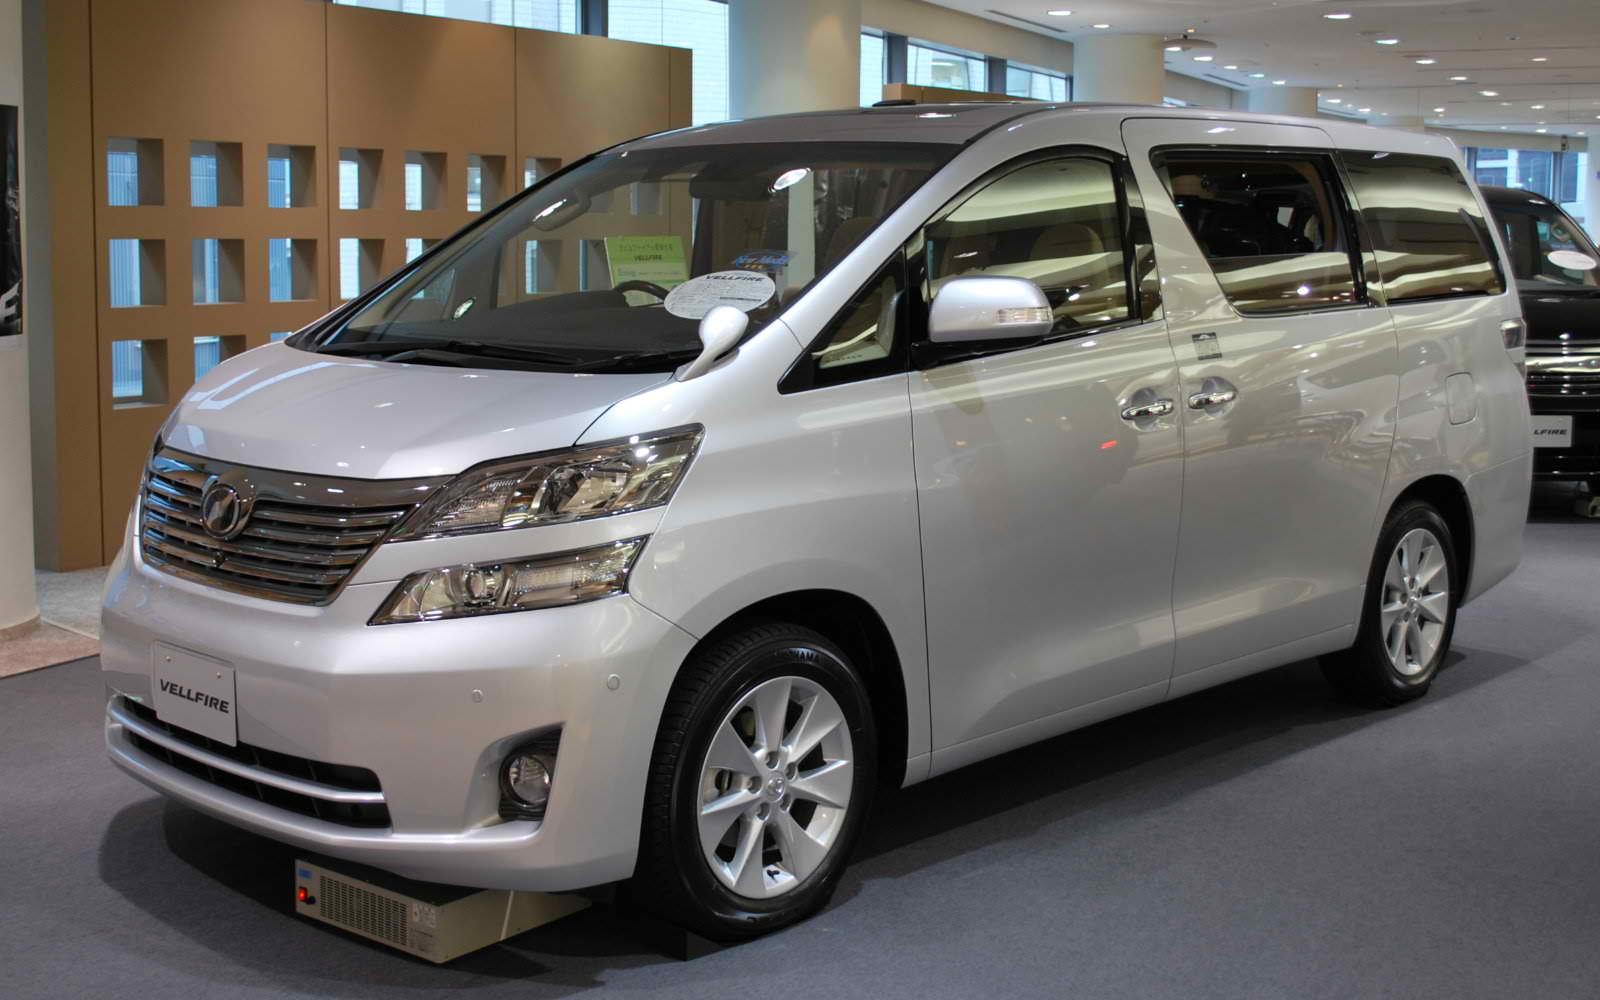 2012 Toyota Vellfire Picture